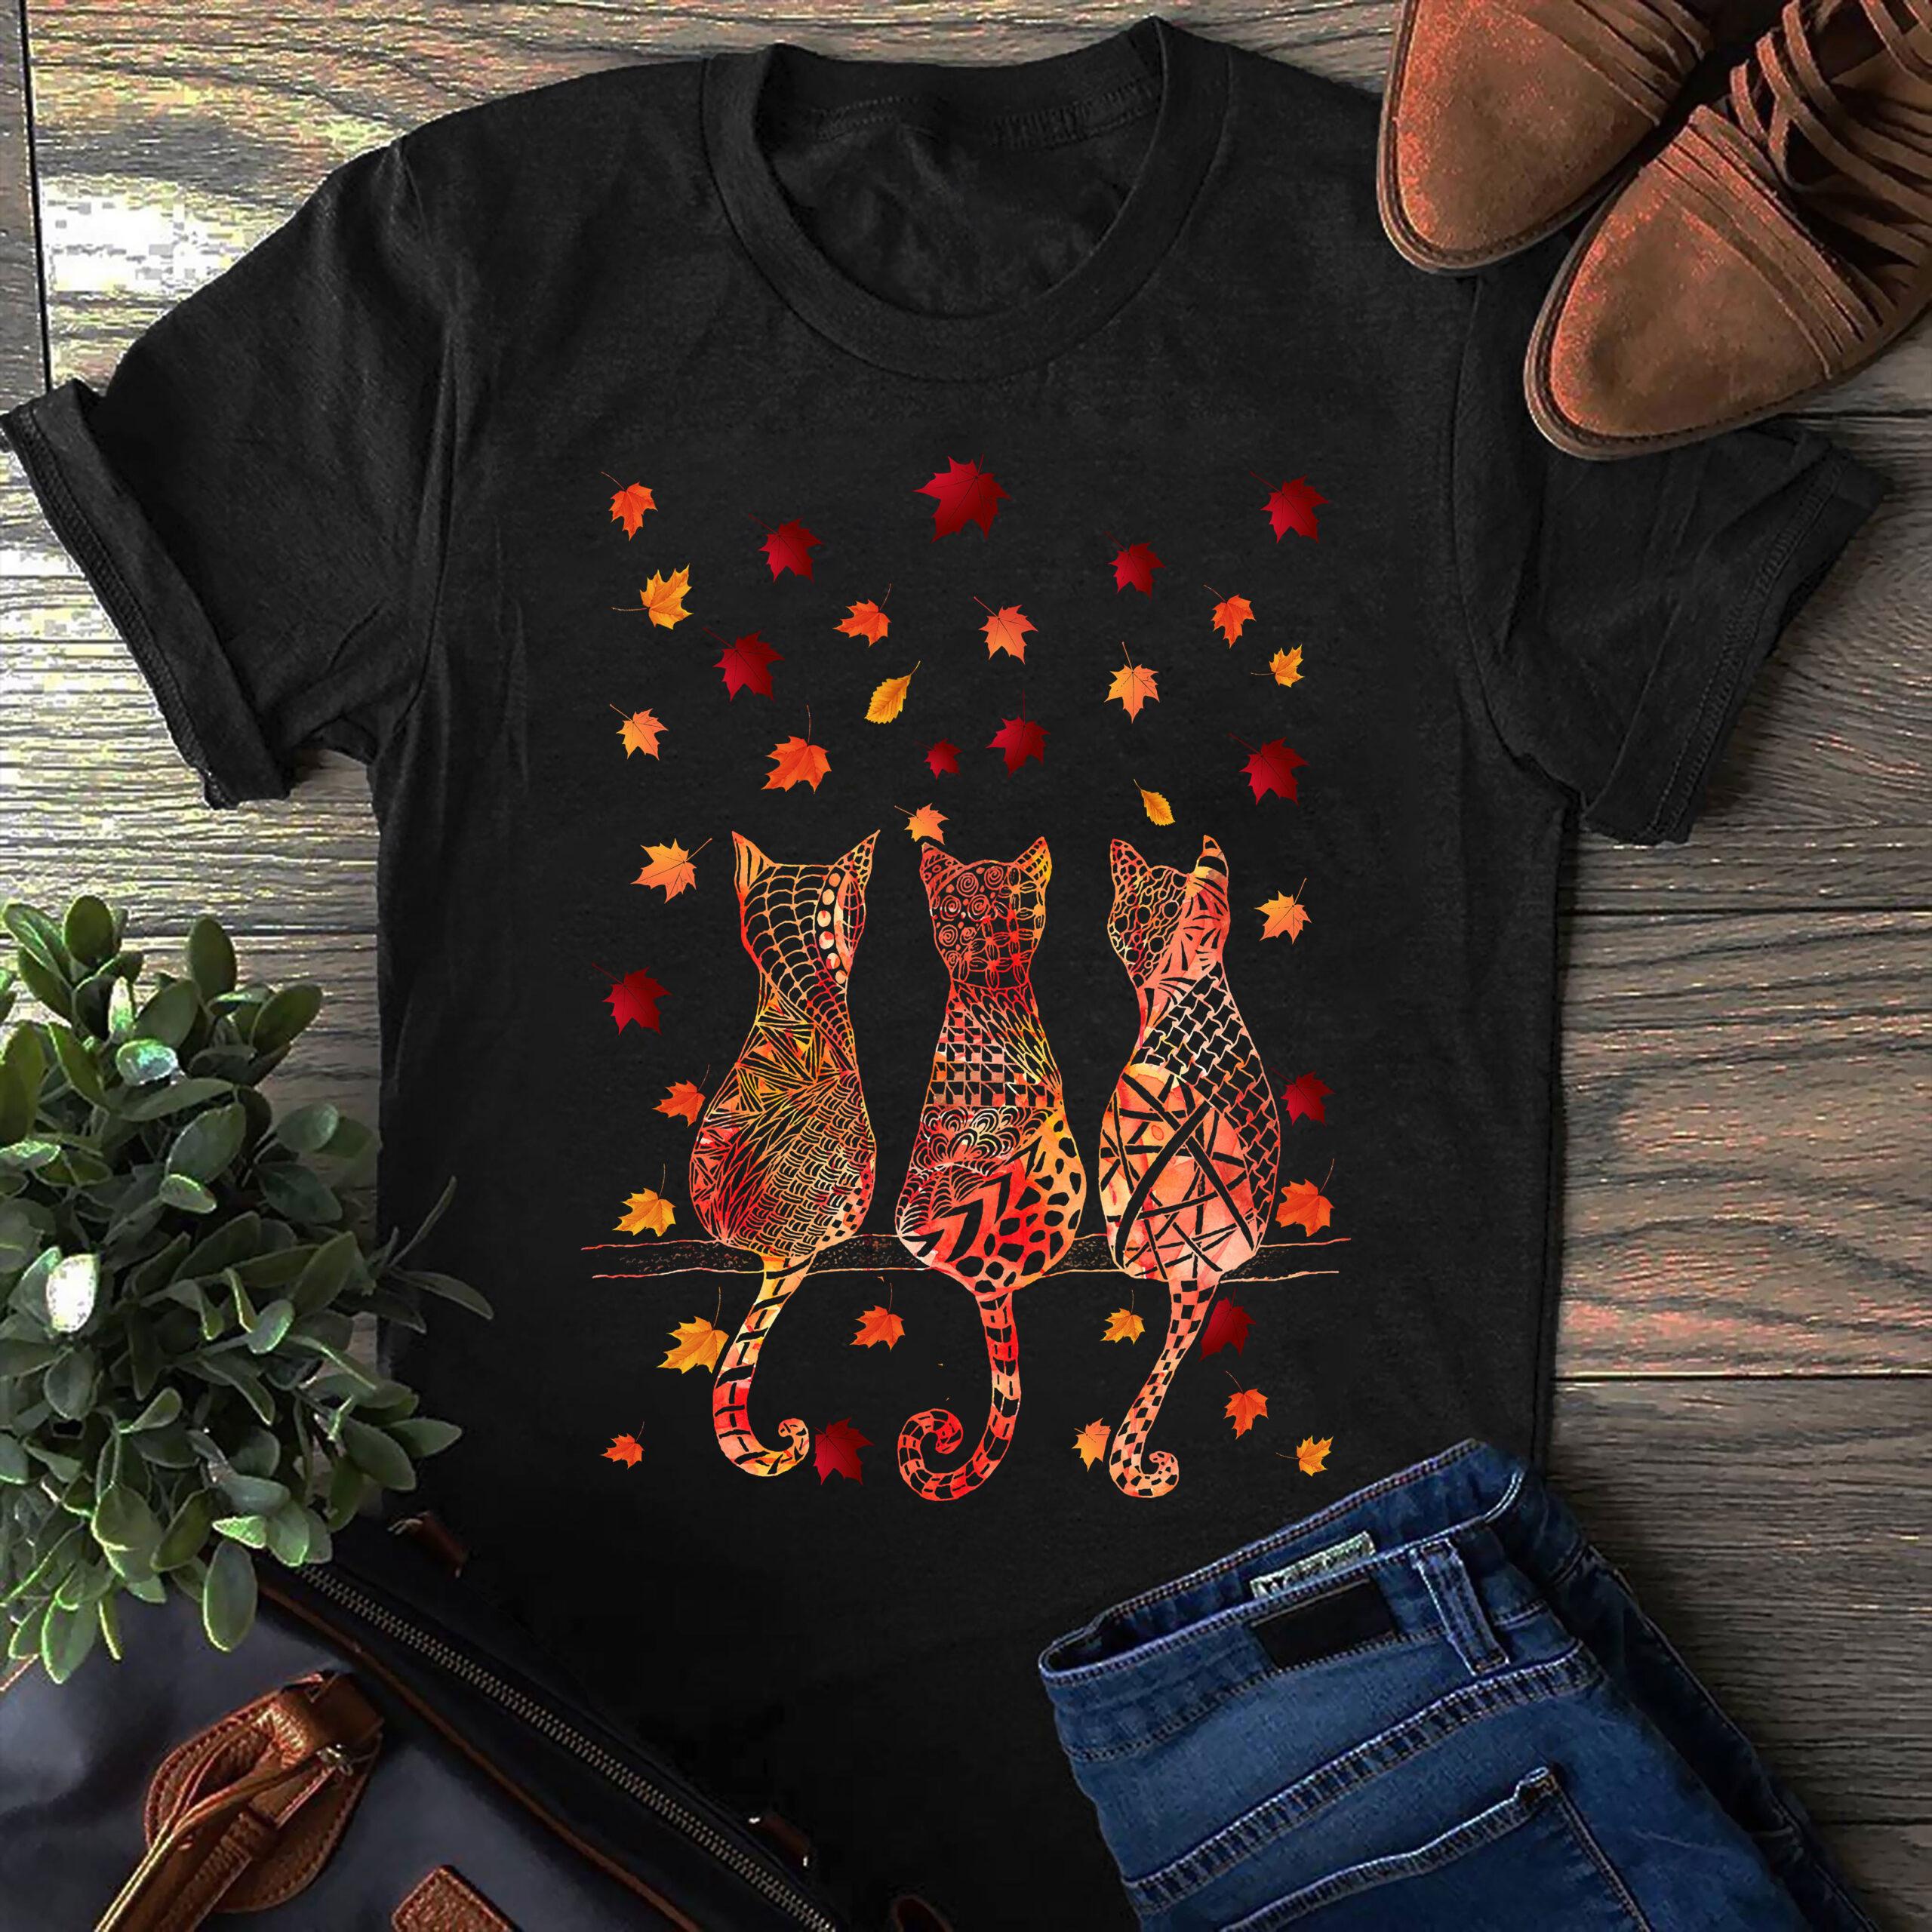 Cat Shirt 3 Cats Back Maple Leaves Falling